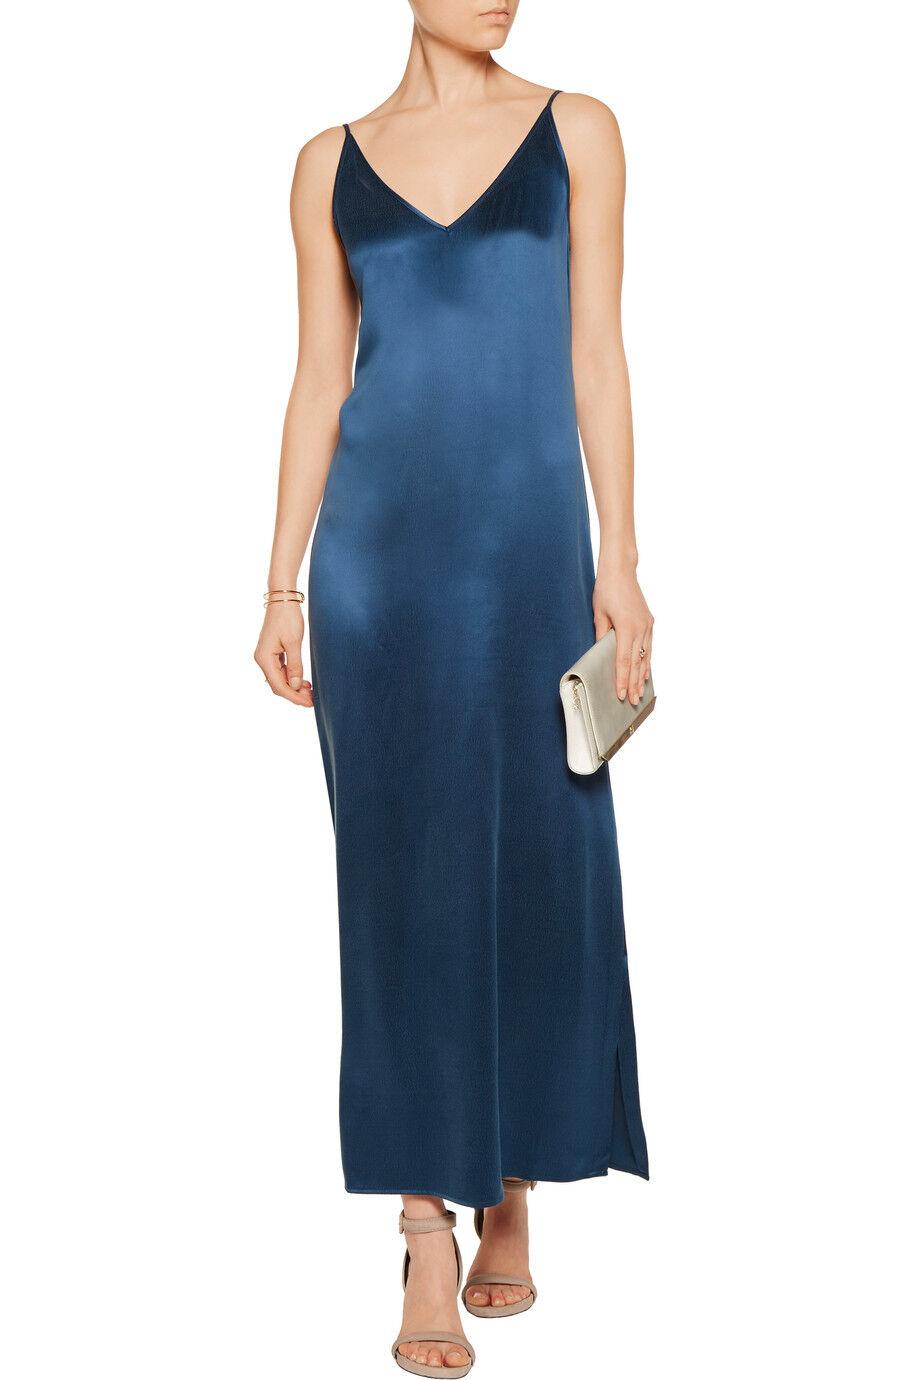 EQUIPMENT Racquel Silk Slip Dress in Majolica bluee Size XS